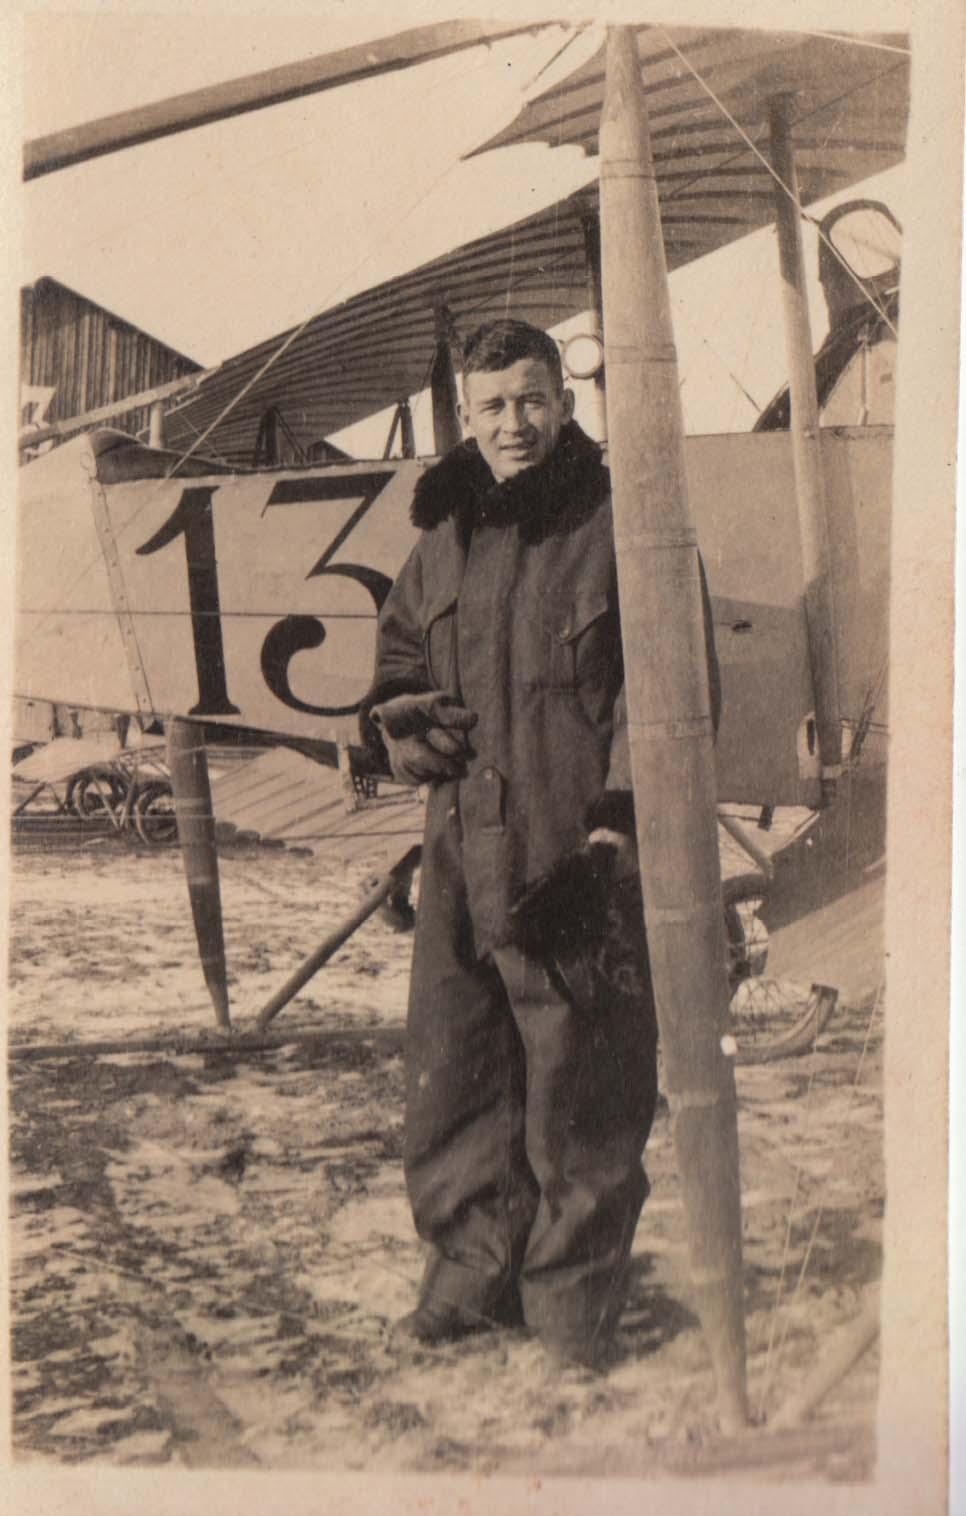 0462 Man in Coat by Plane